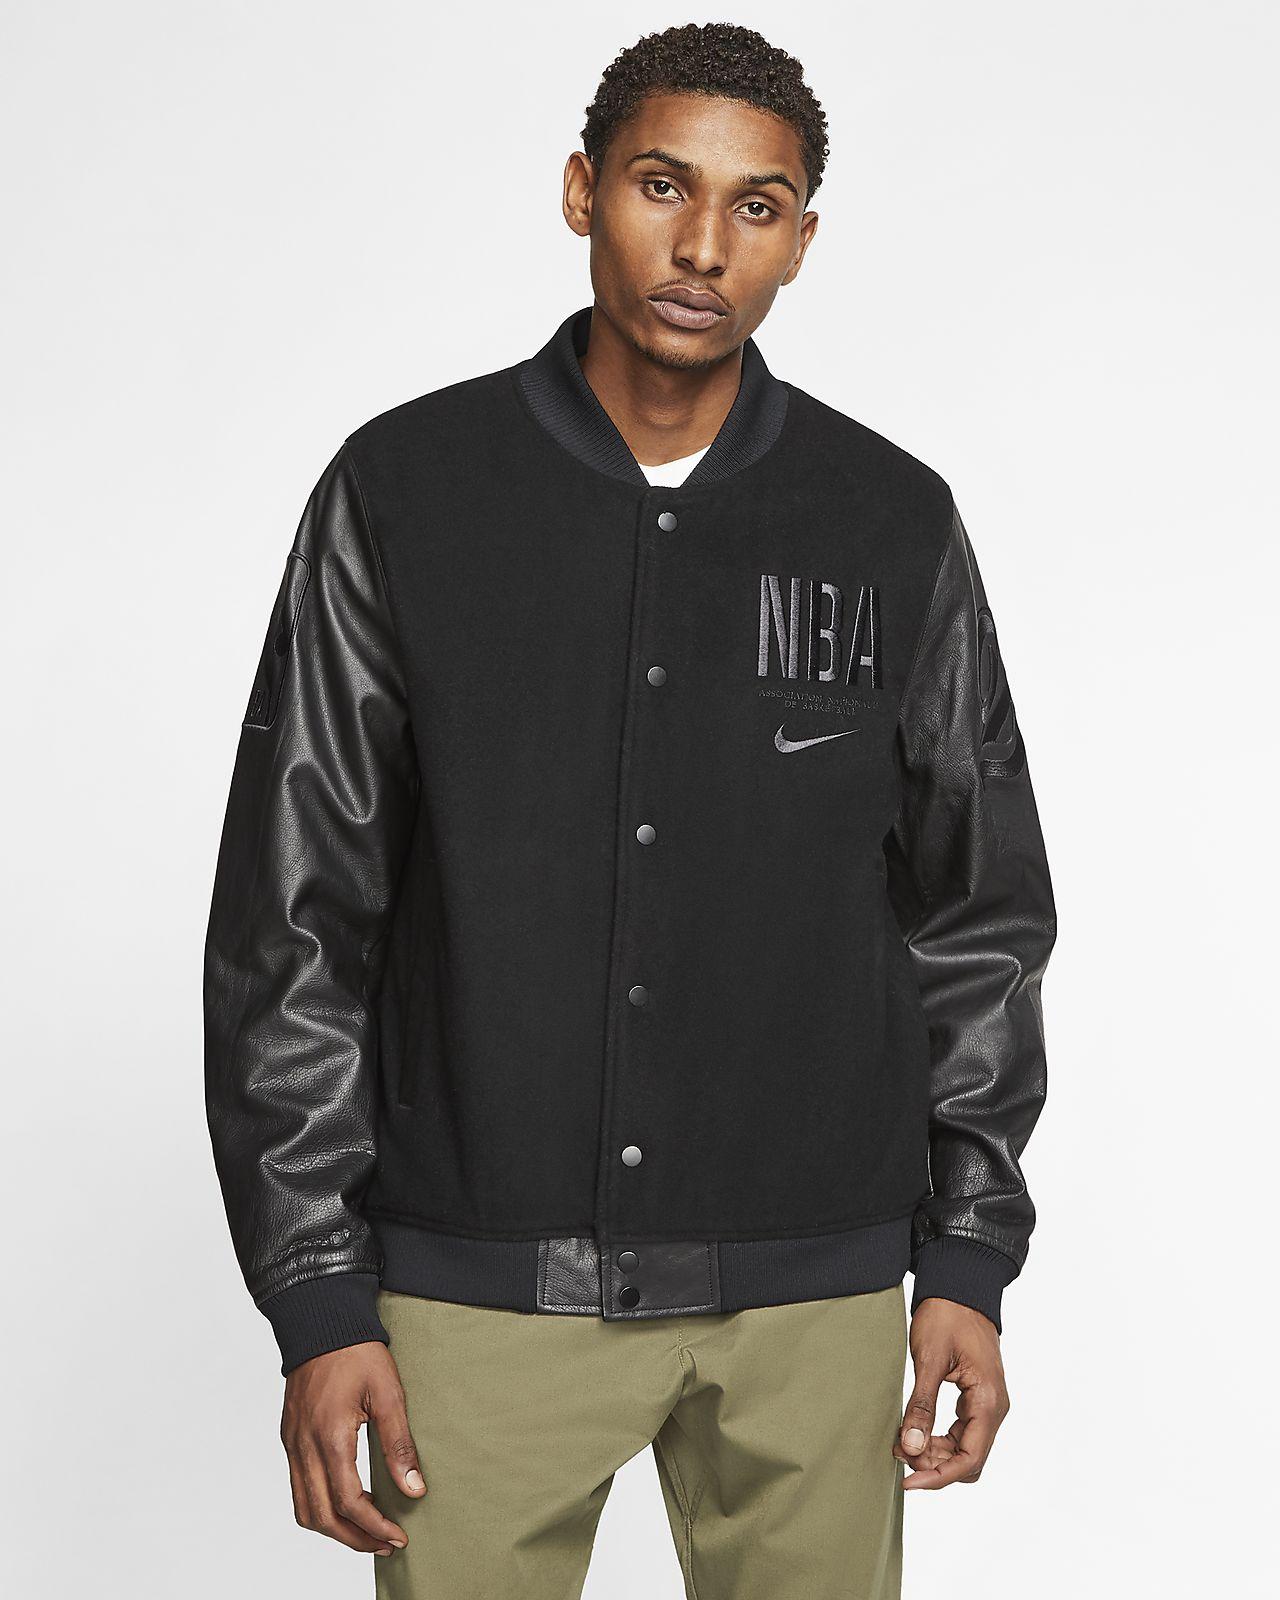 Nike Courtside 'Paris' Men's NBA Destroyer Jacket